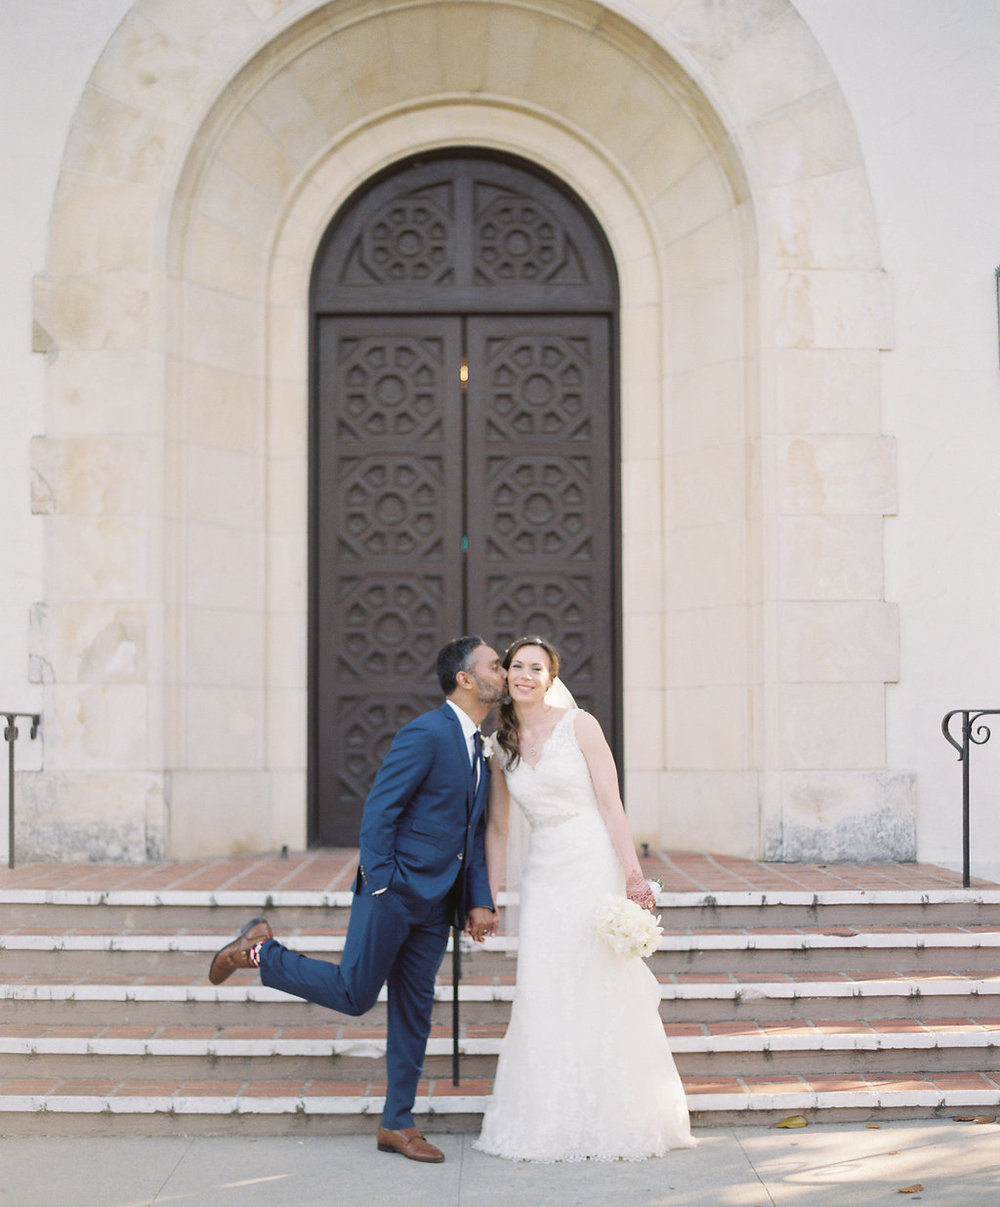 www.santabarbarawedding.com | Unitarian Society | Percy Sales | Steven Leyva | Bride and Groom